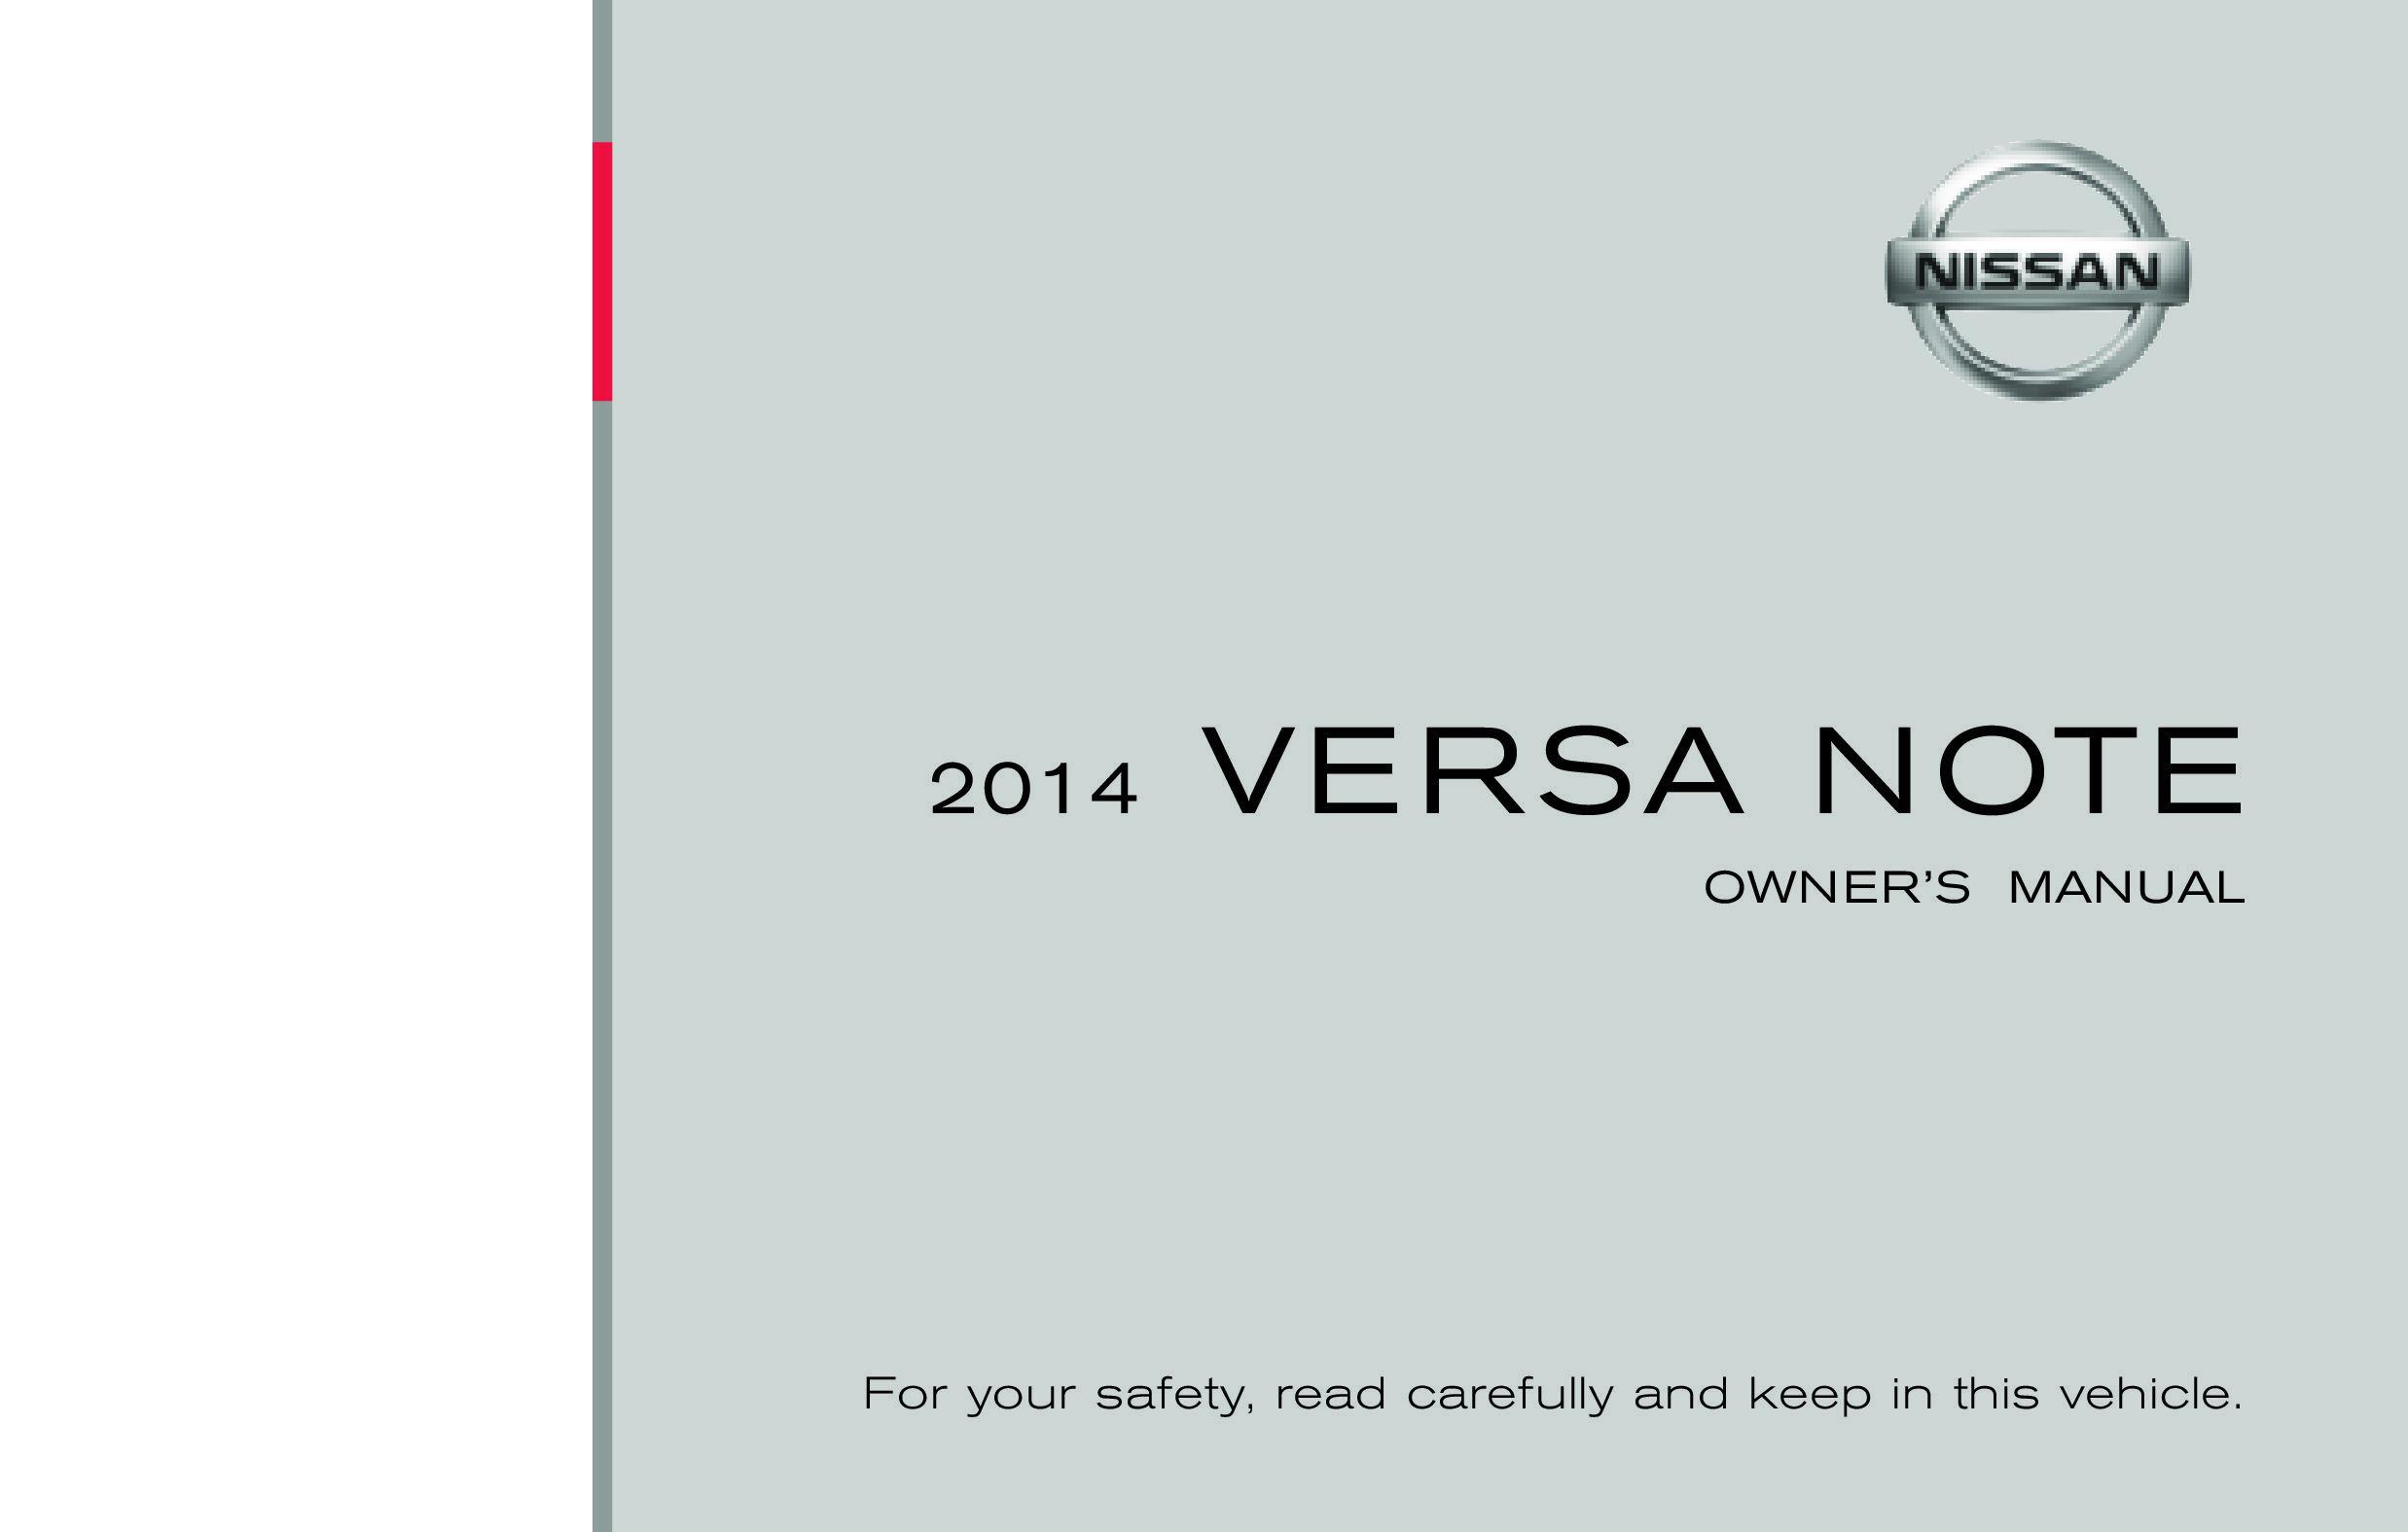 2014 Nissan Versa Note owners manual